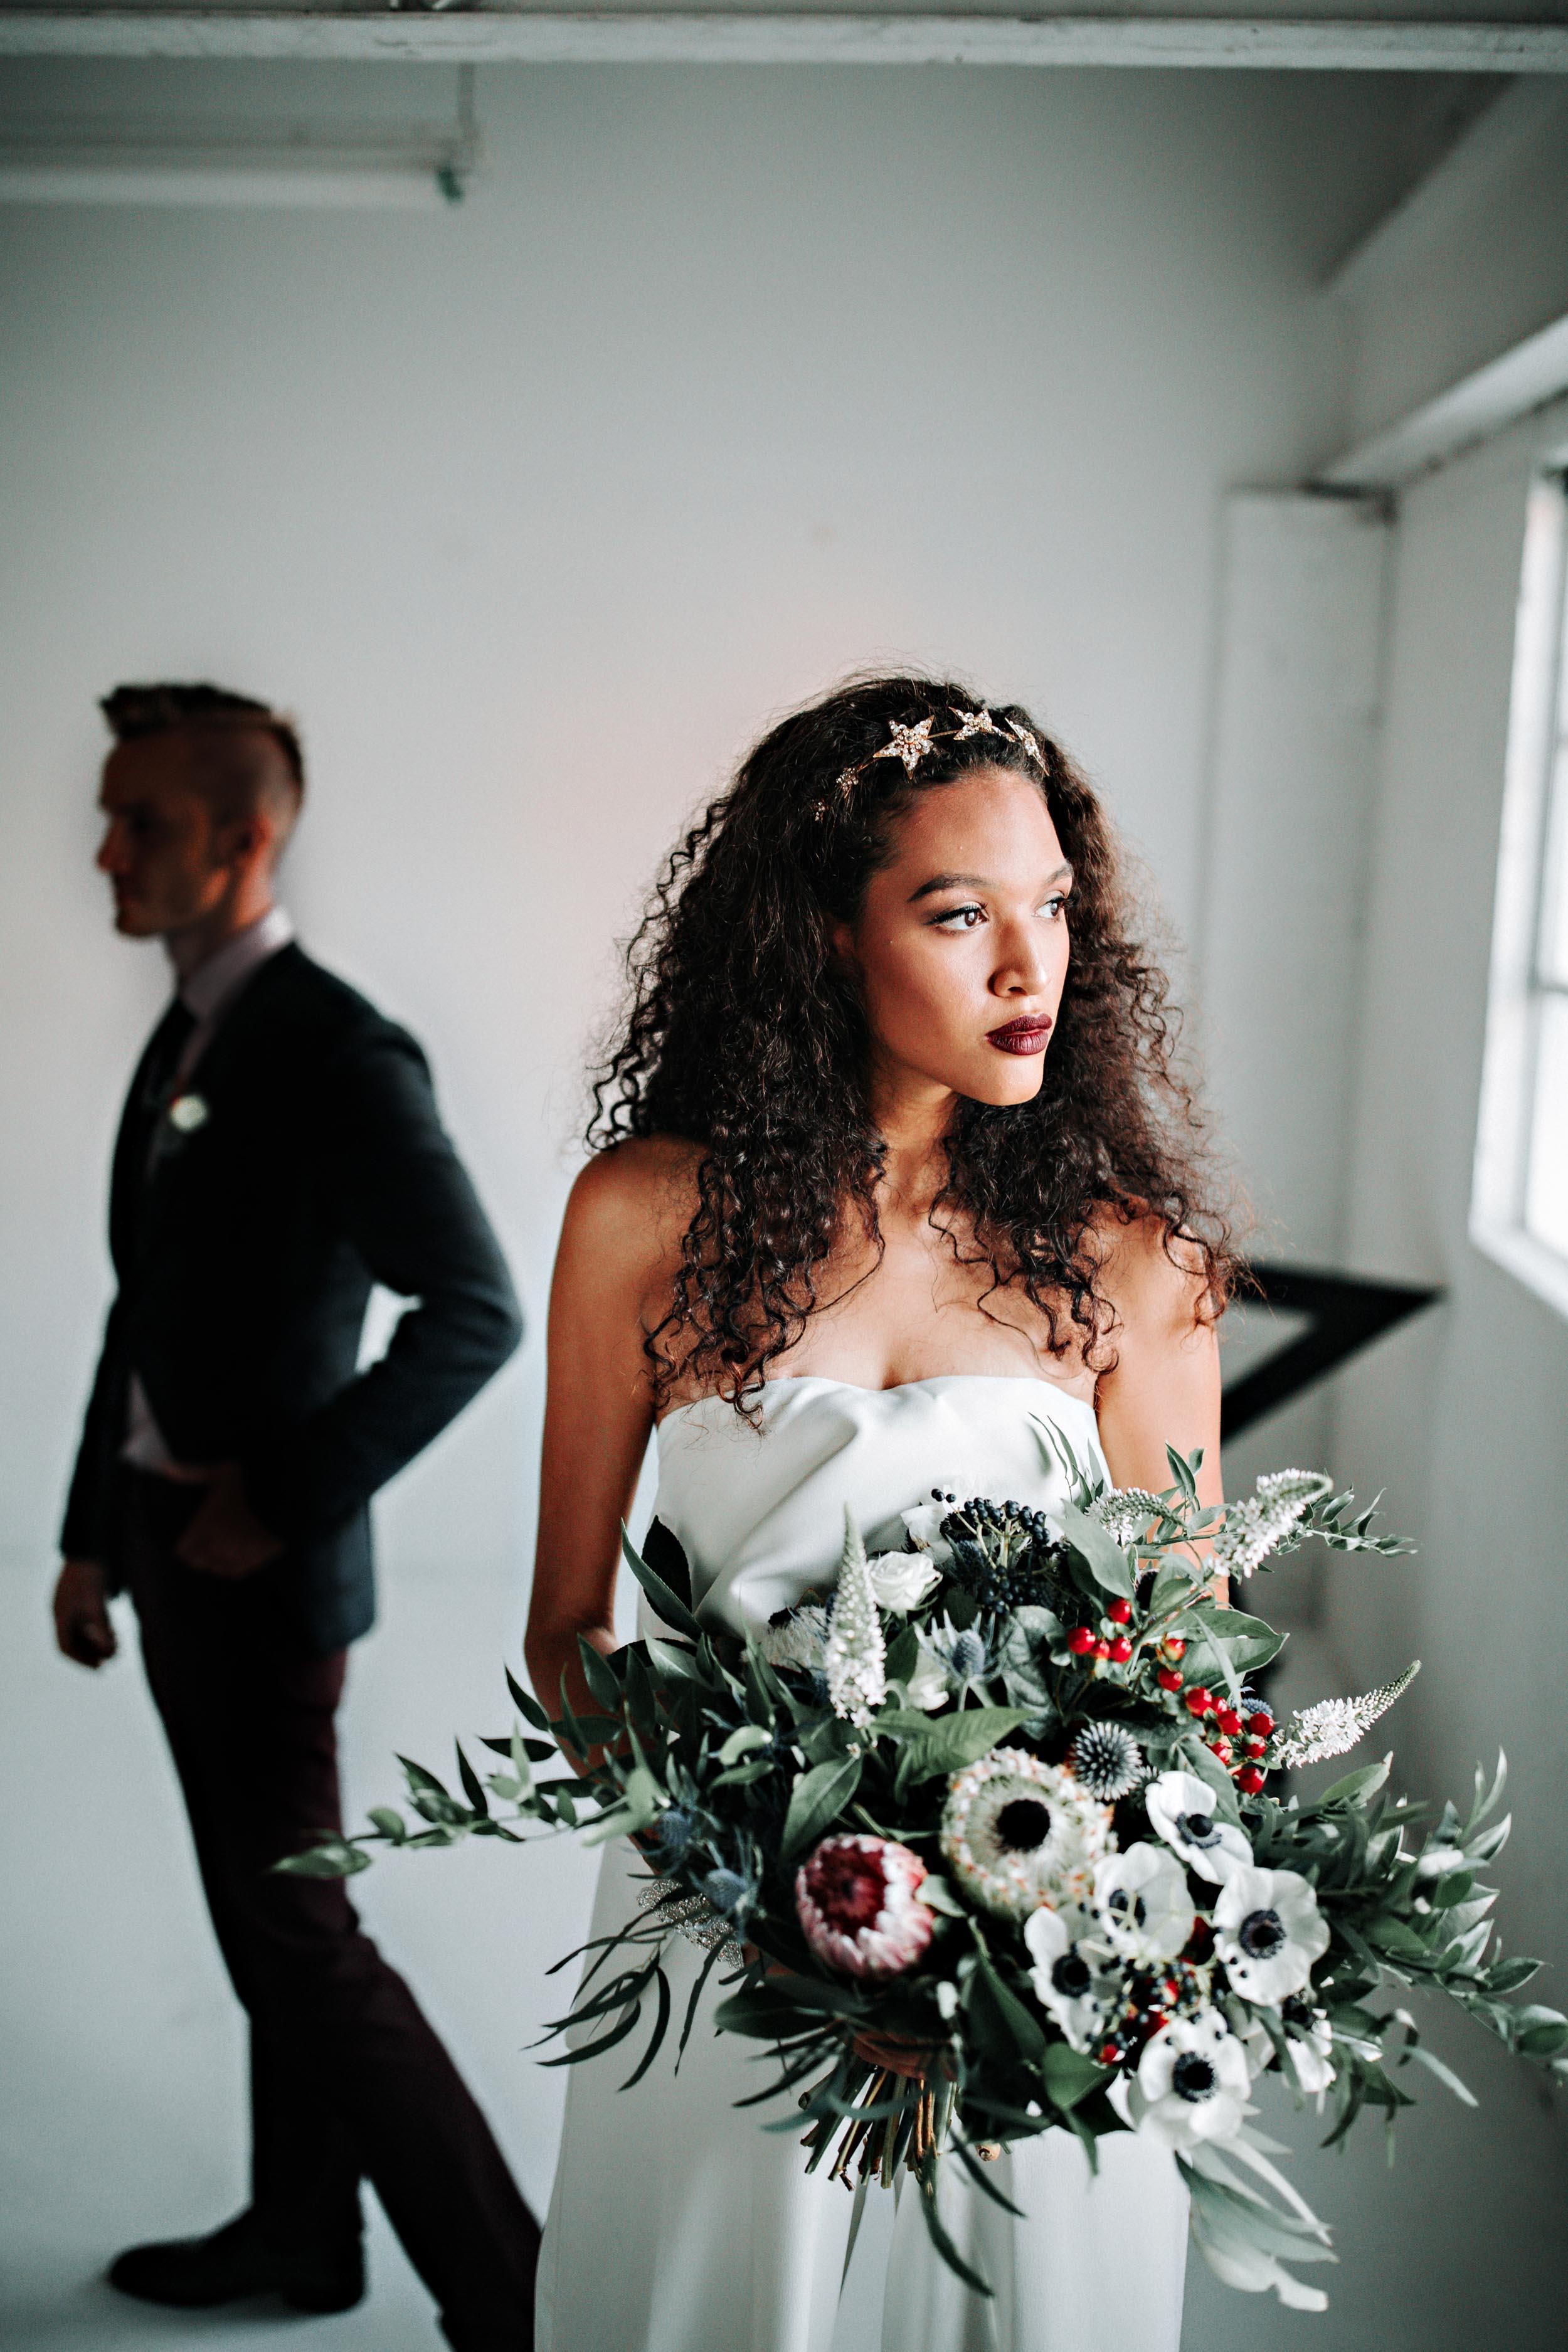 weddings-starsstripes-06.jpg